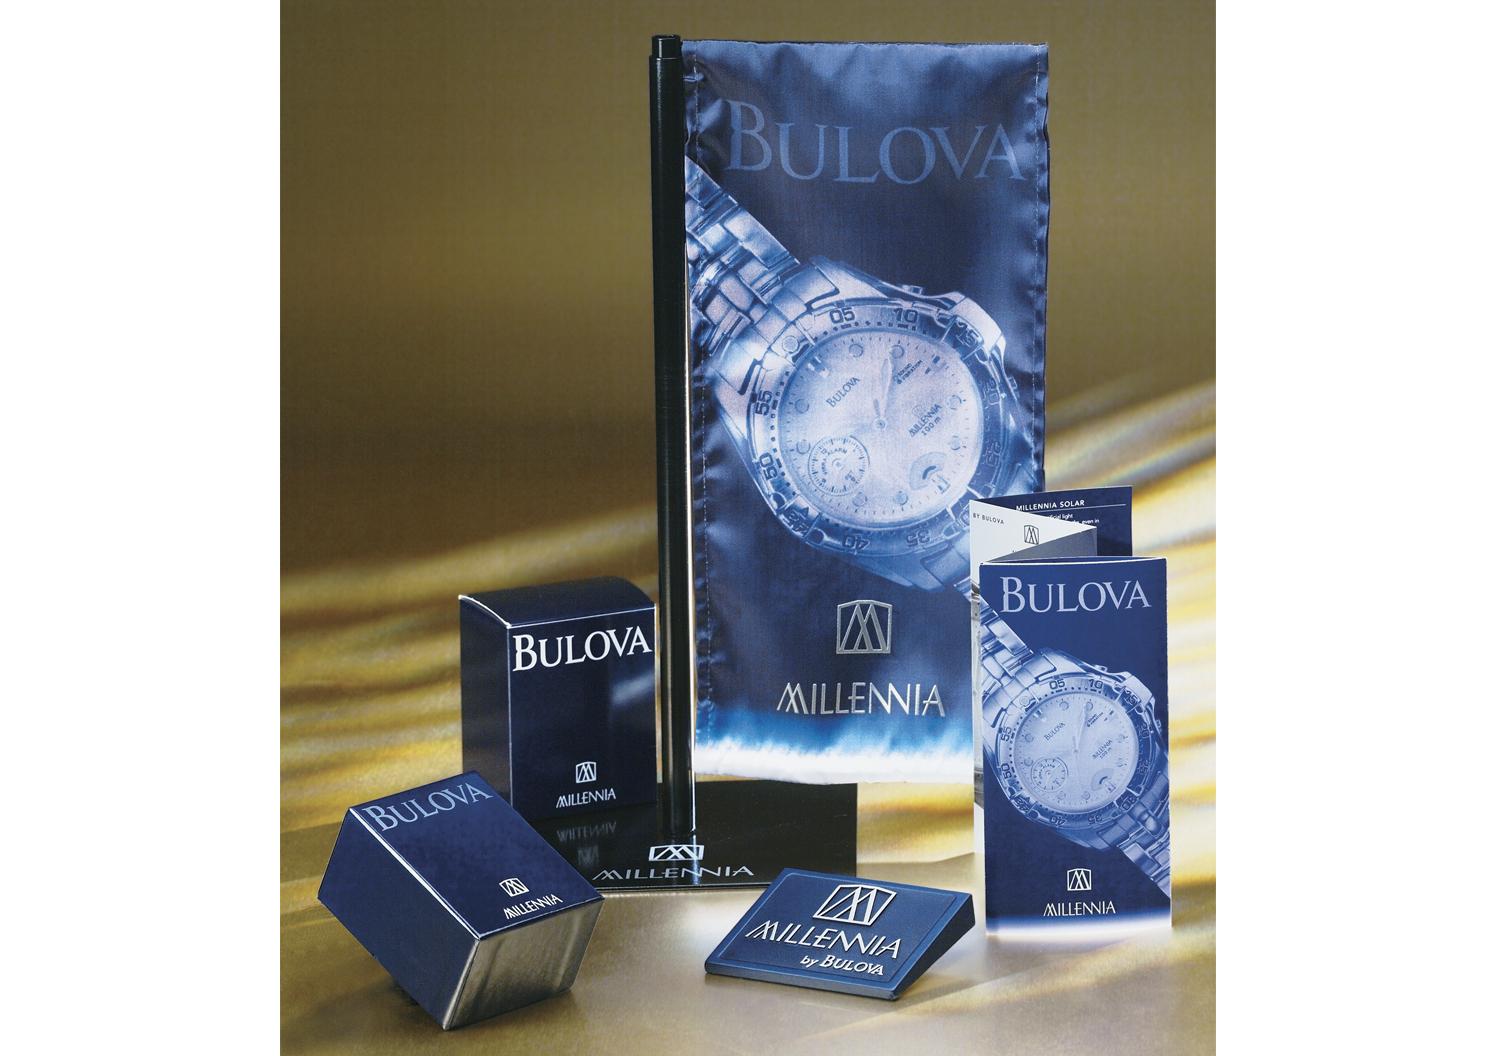 Bulova Millennia Package/Display Program